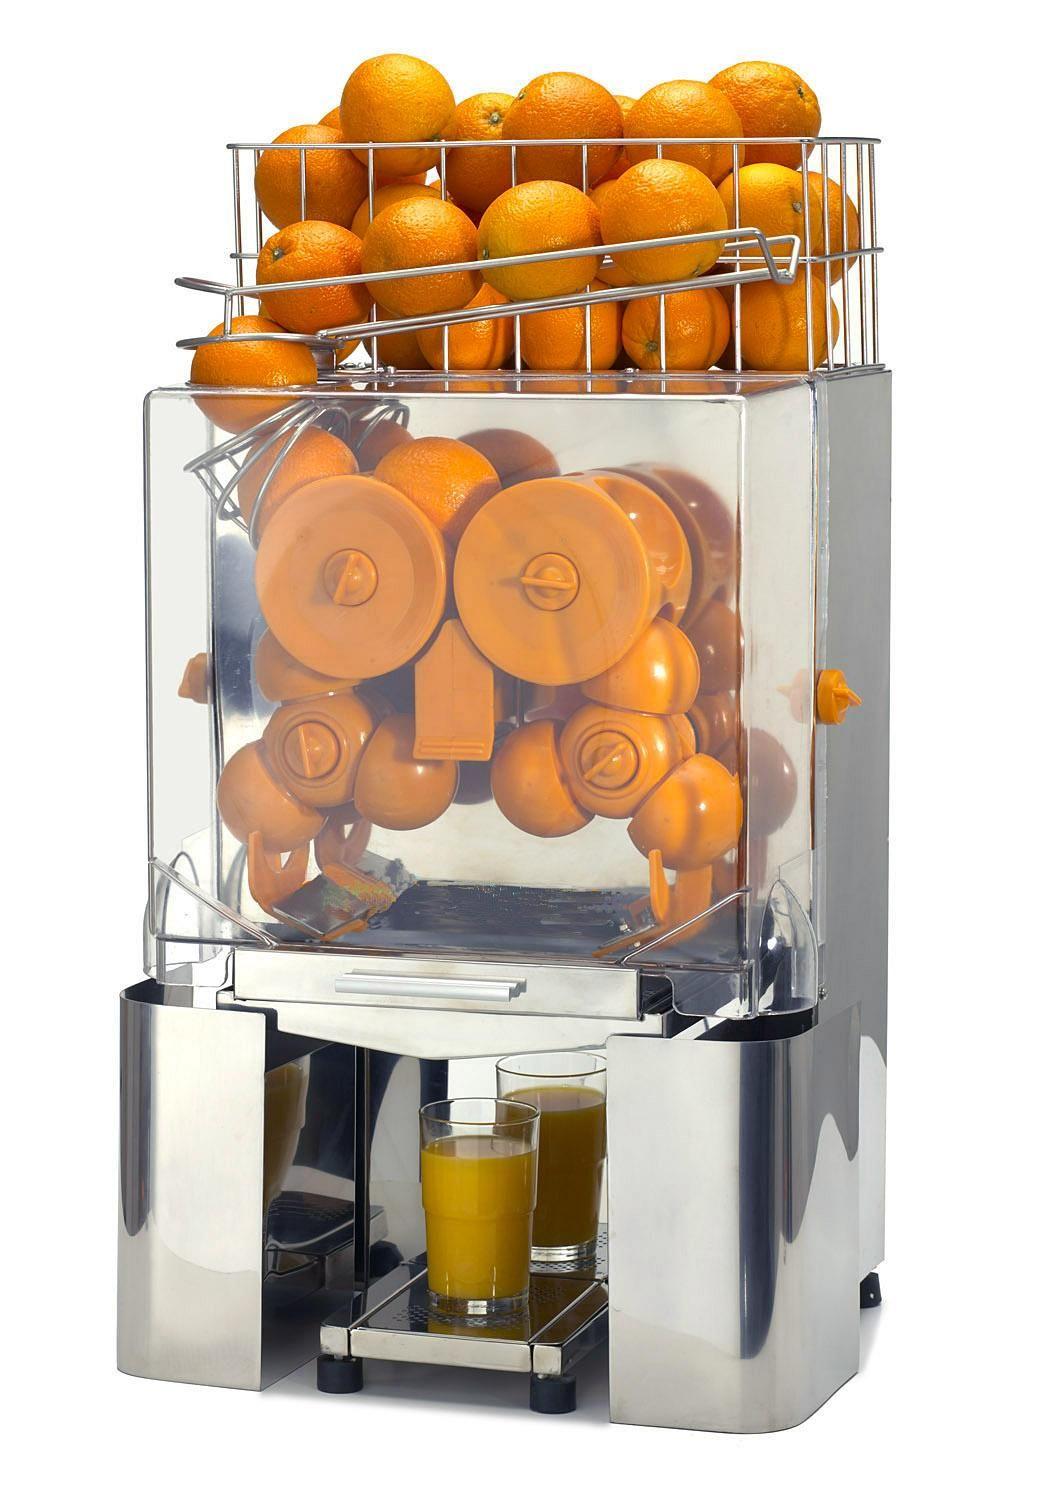 A professional orange juicer! Nice! Juicer machine